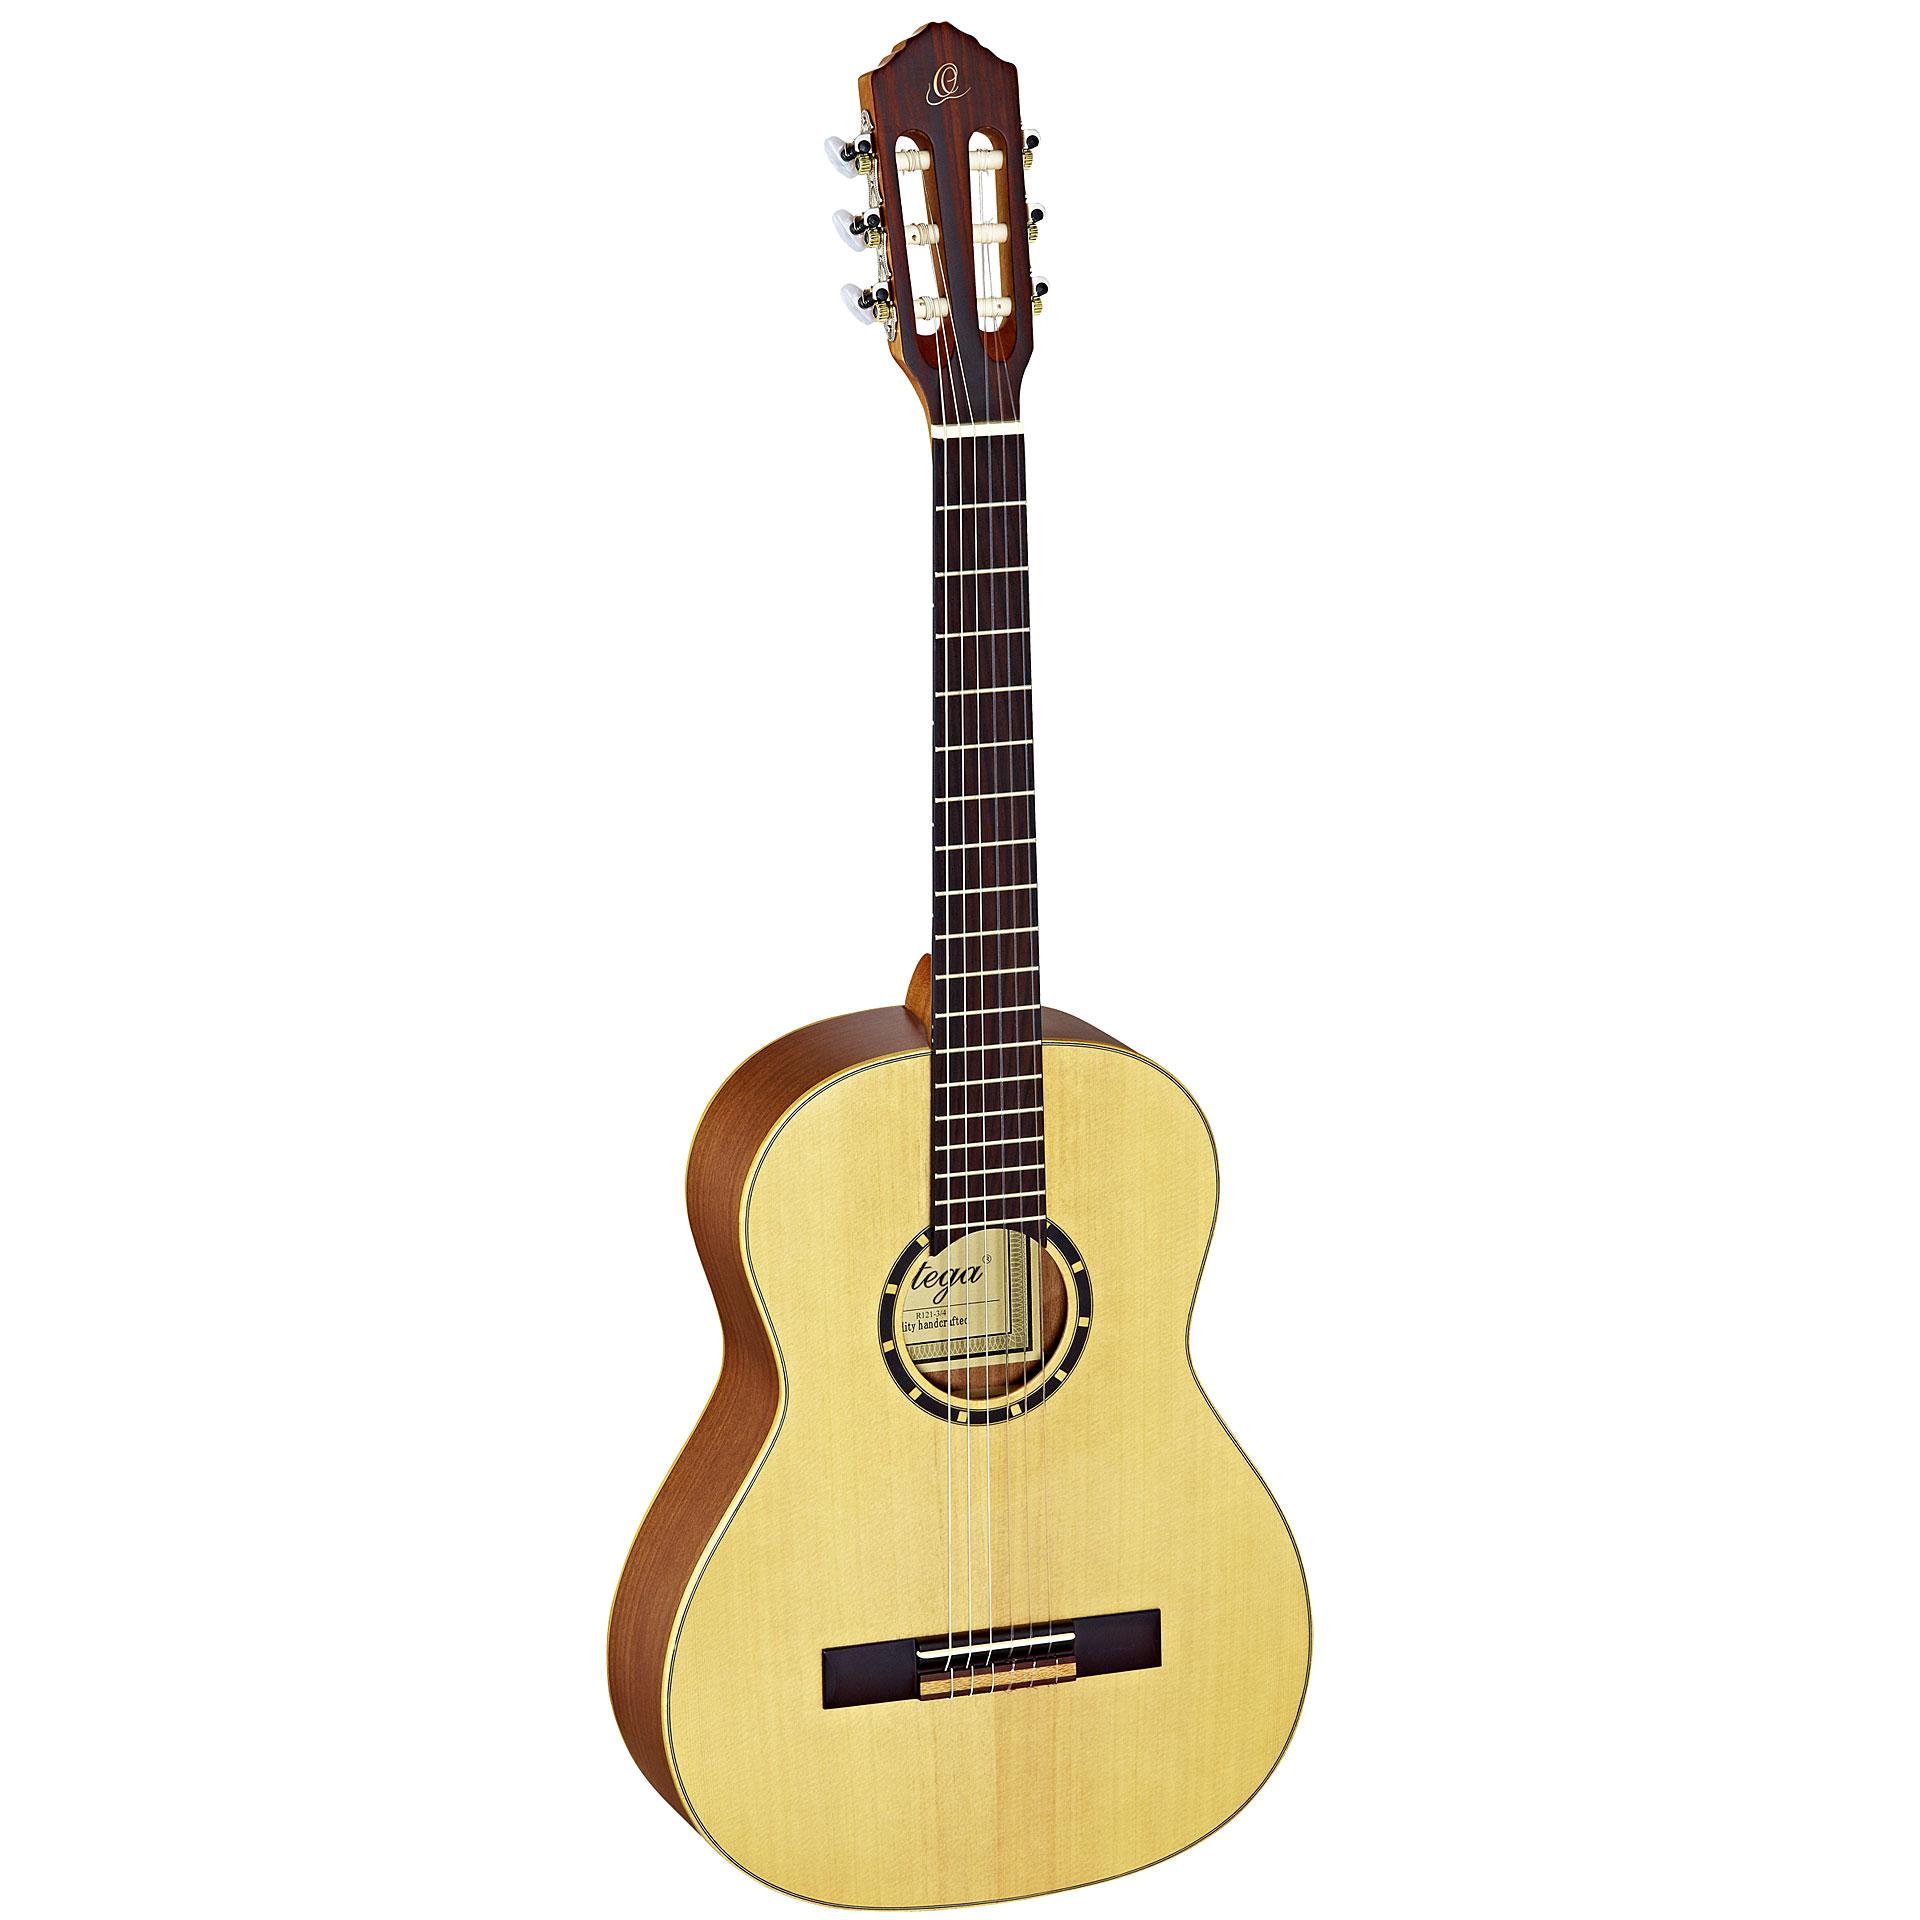 ortega r121 3 4 guitare classique. Black Bedroom Furniture Sets. Home Design Ideas